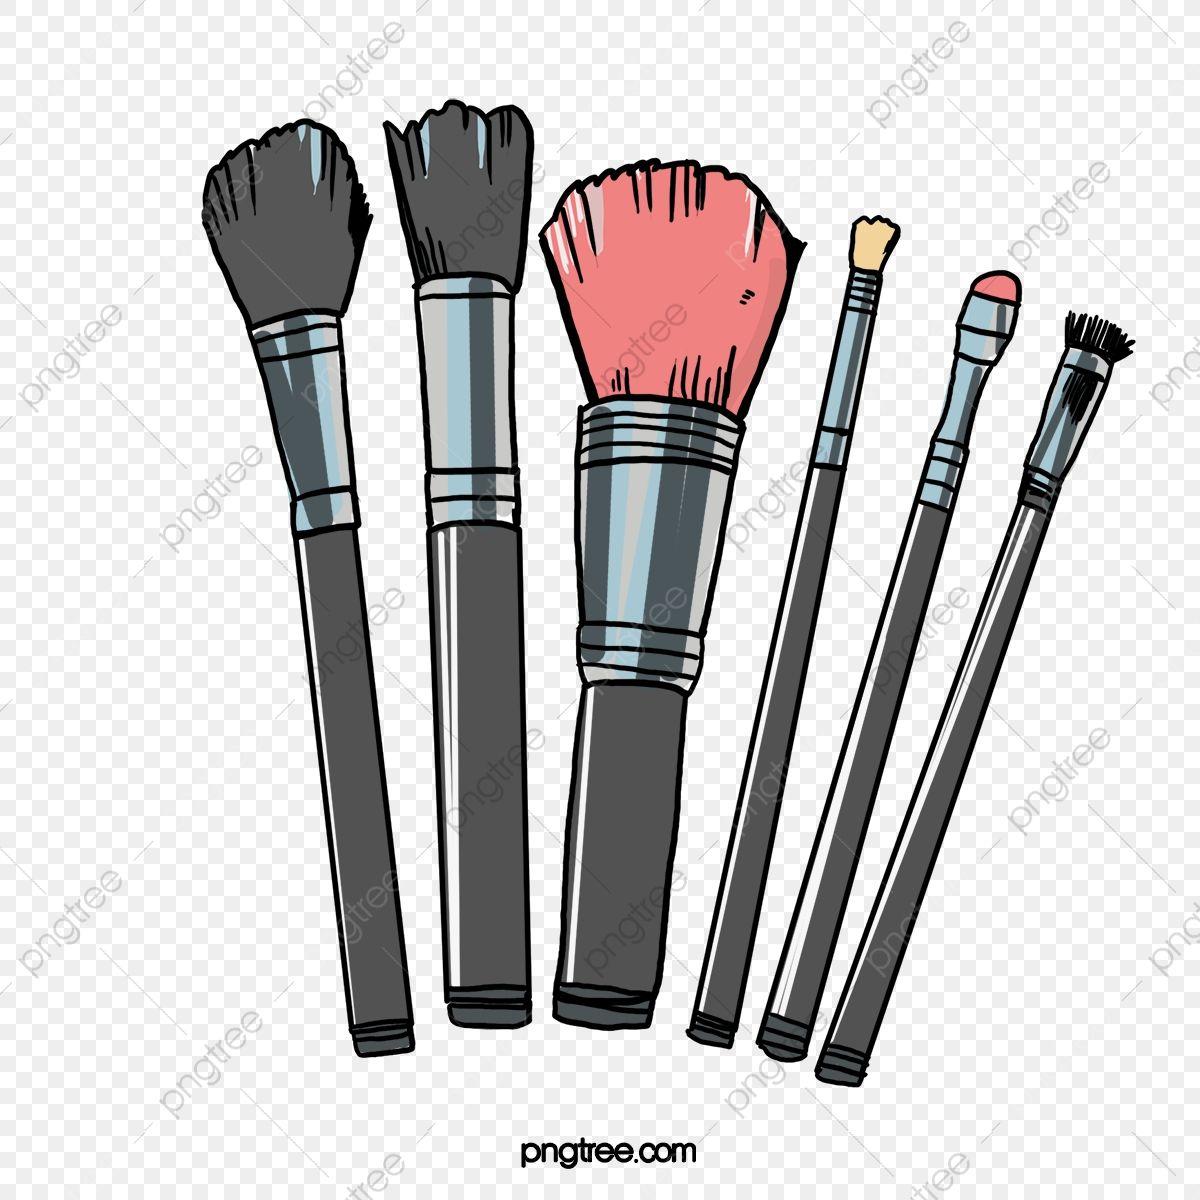 Hand Painted Makeup Brush Brush Effect, Makeup Clipart.